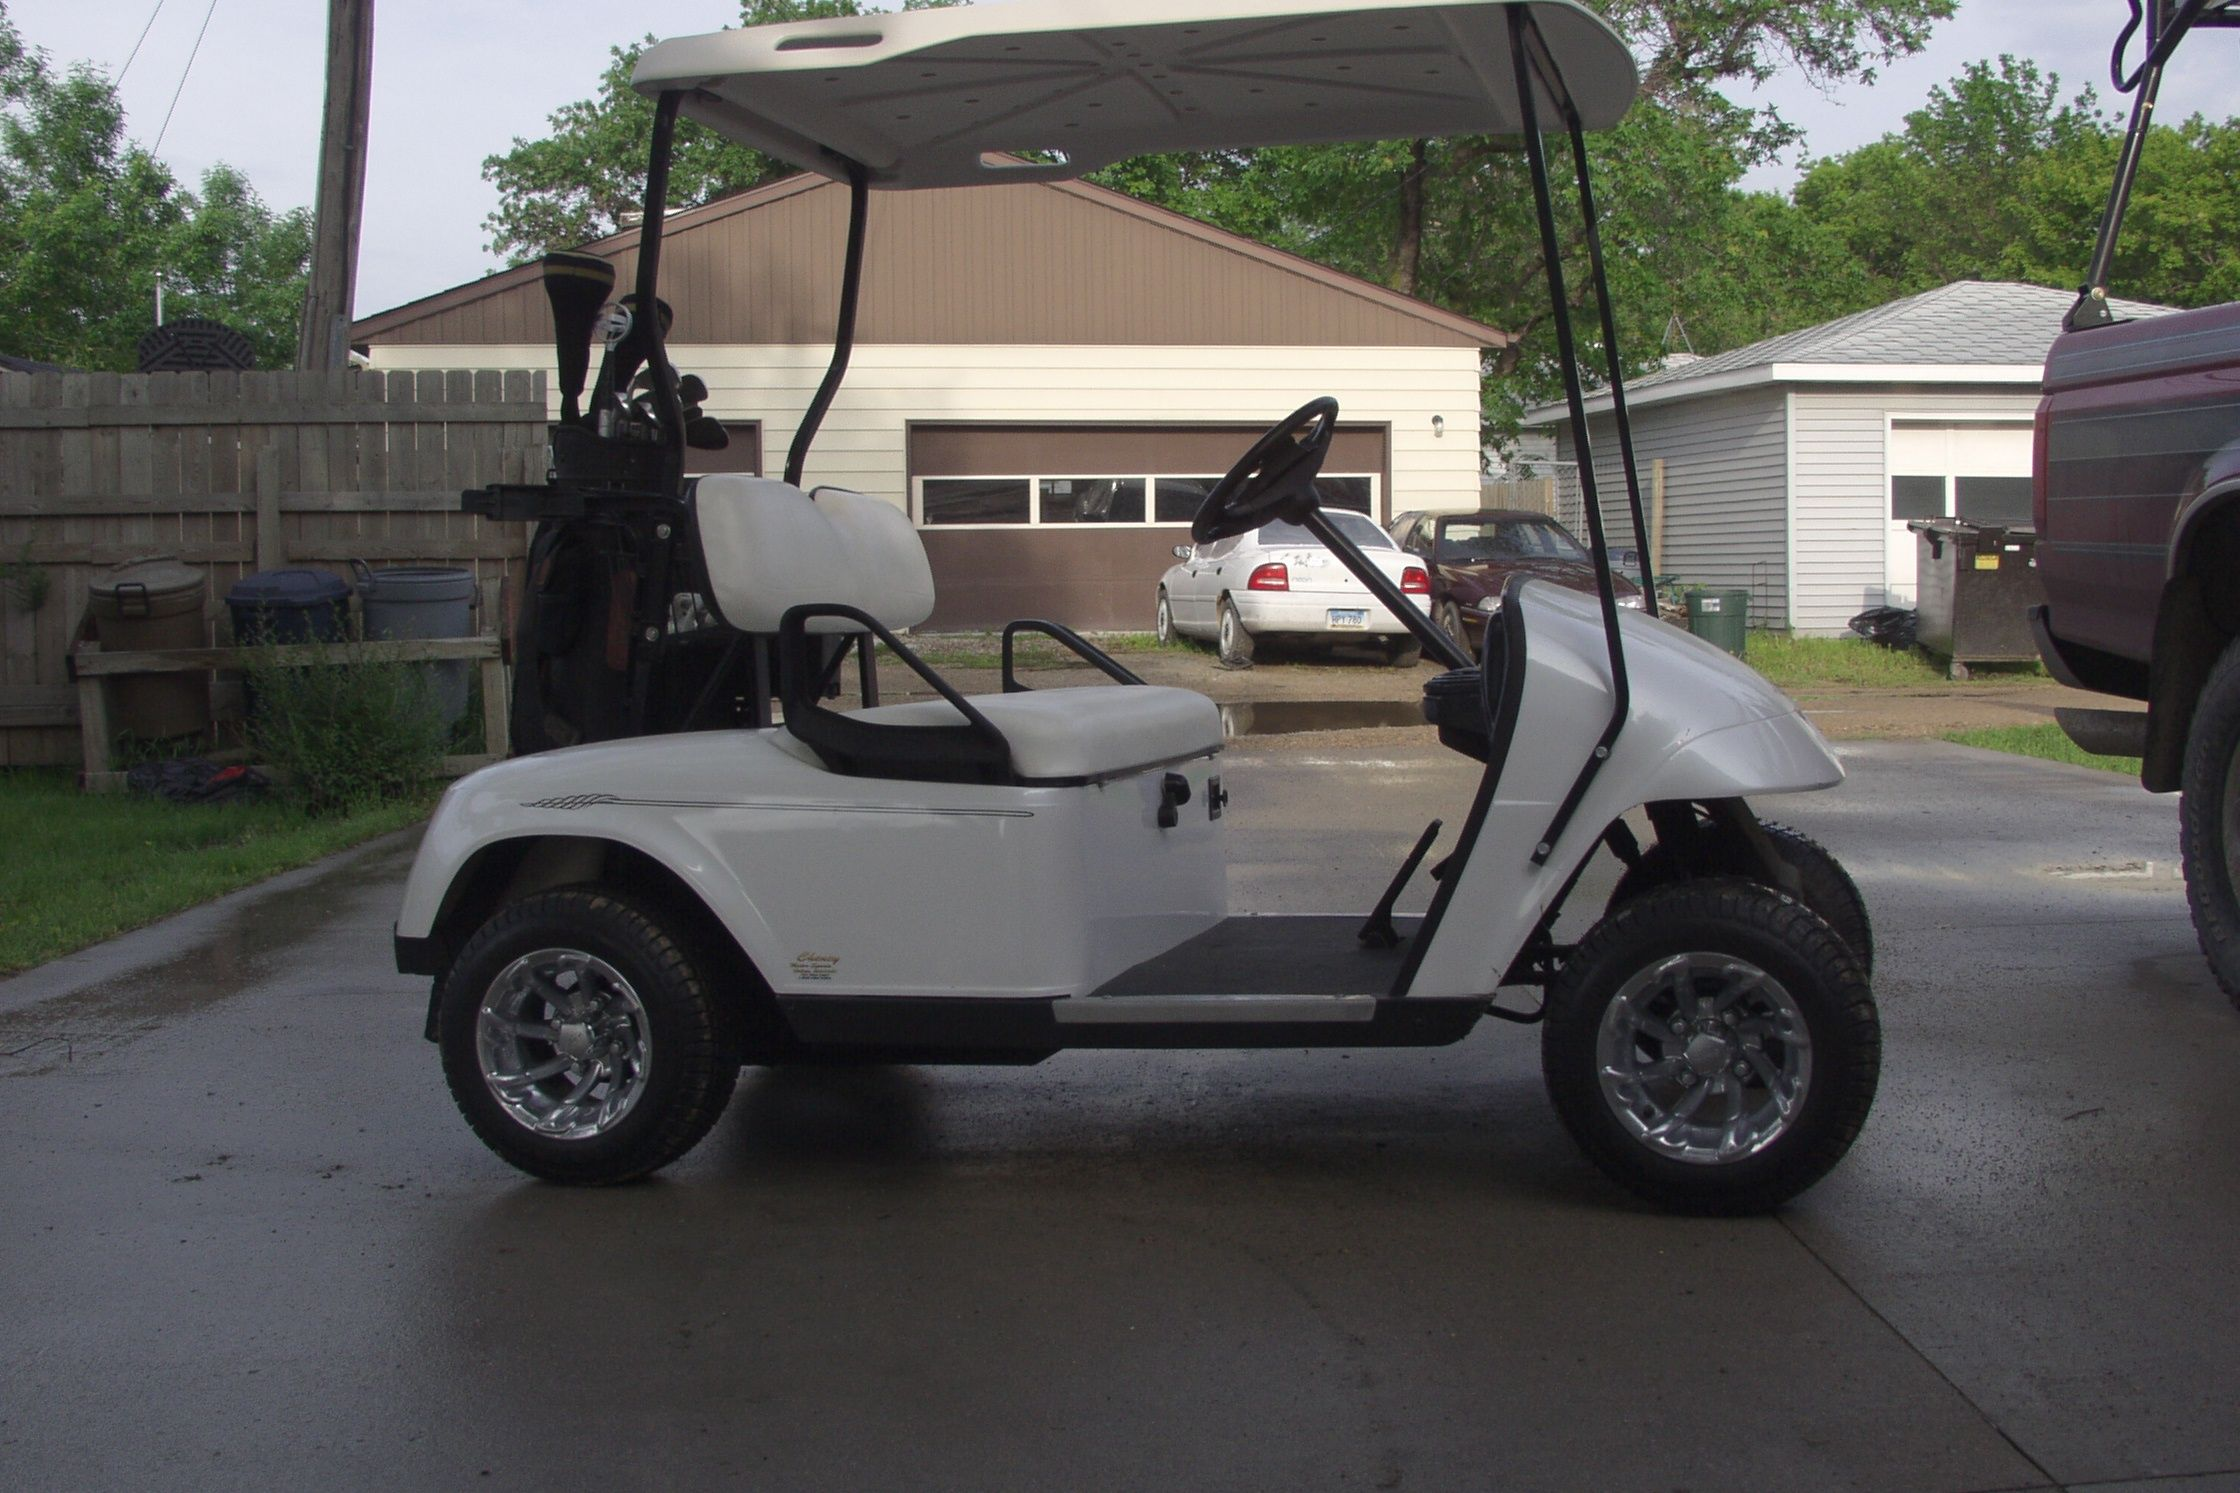 2002 Ez Go gas golf cart, Pearl white paint , carbon Fiber dash , custom rims and tires.